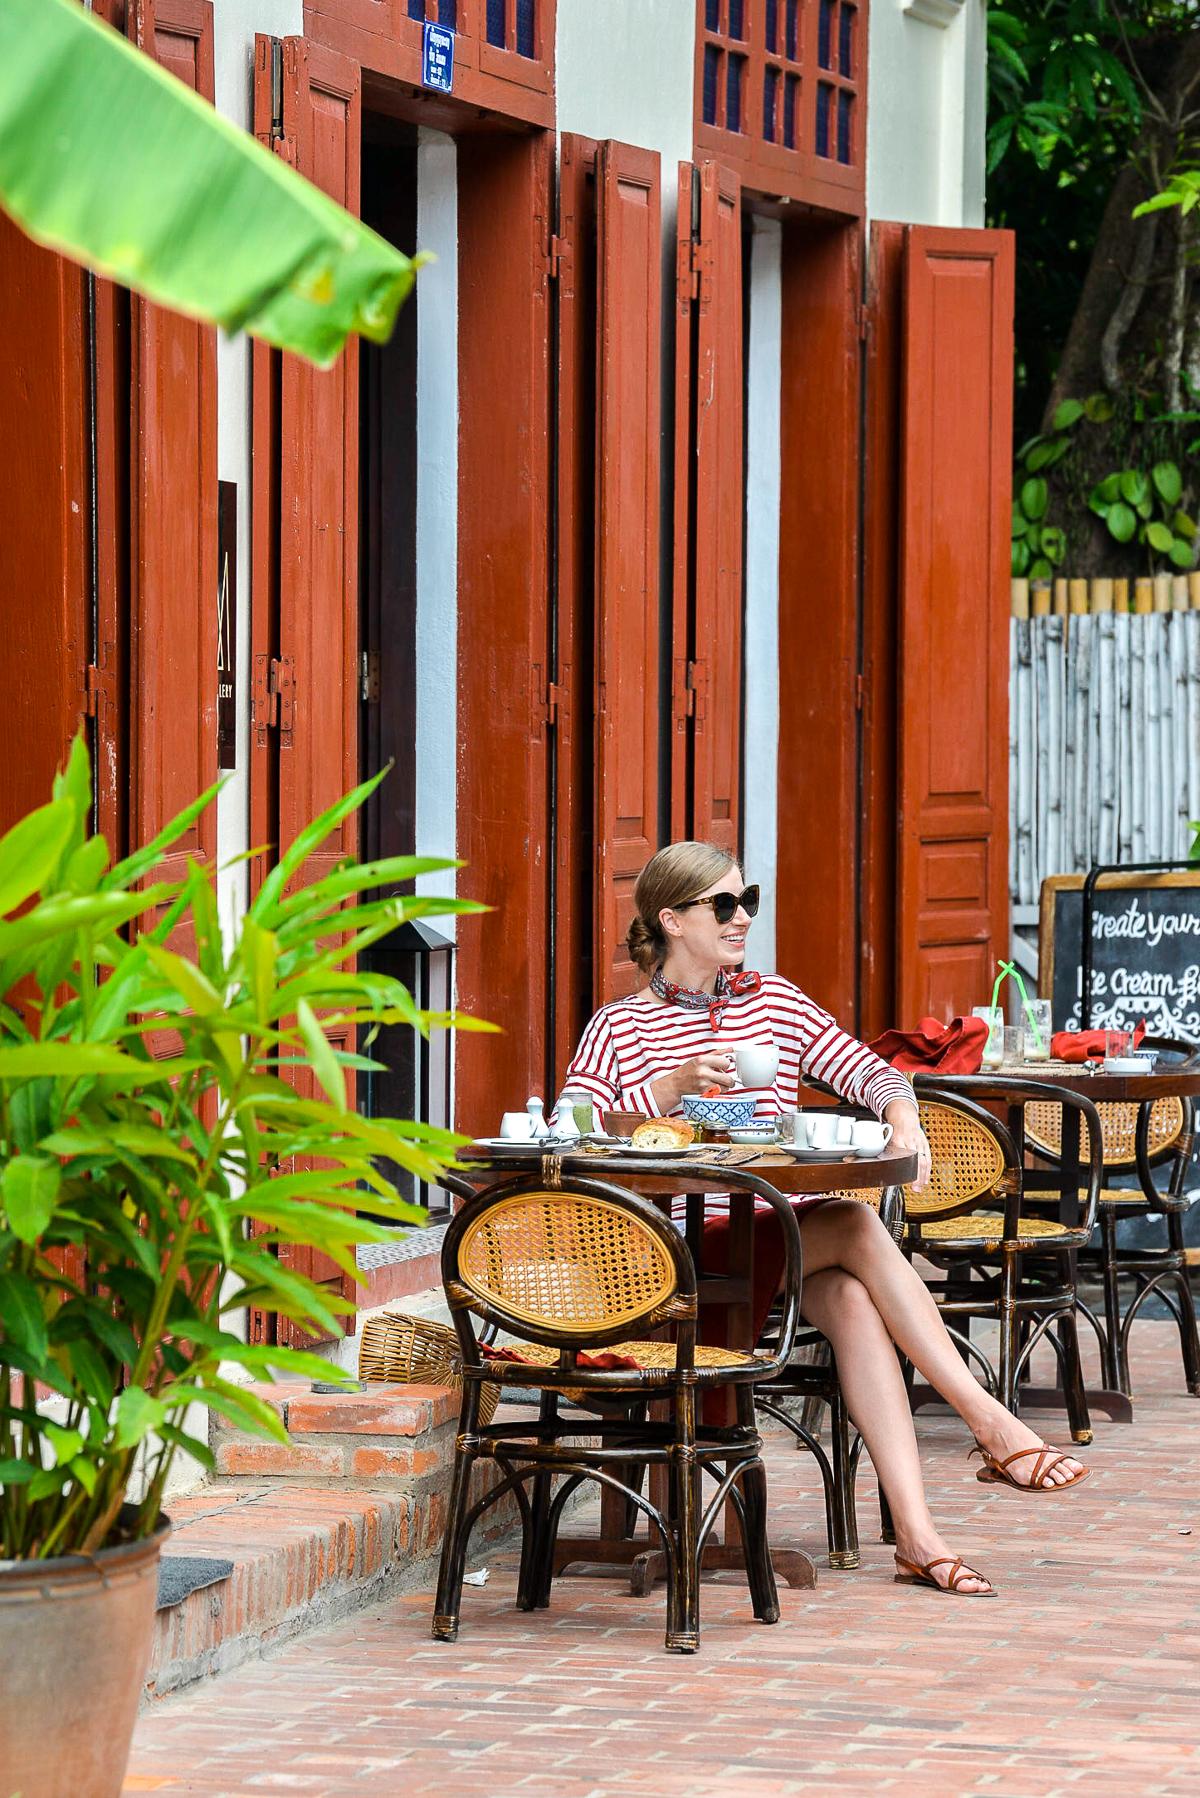 Stacie Flinner 3 Nagas Complete Guide to Luang Prabang-79.jpg